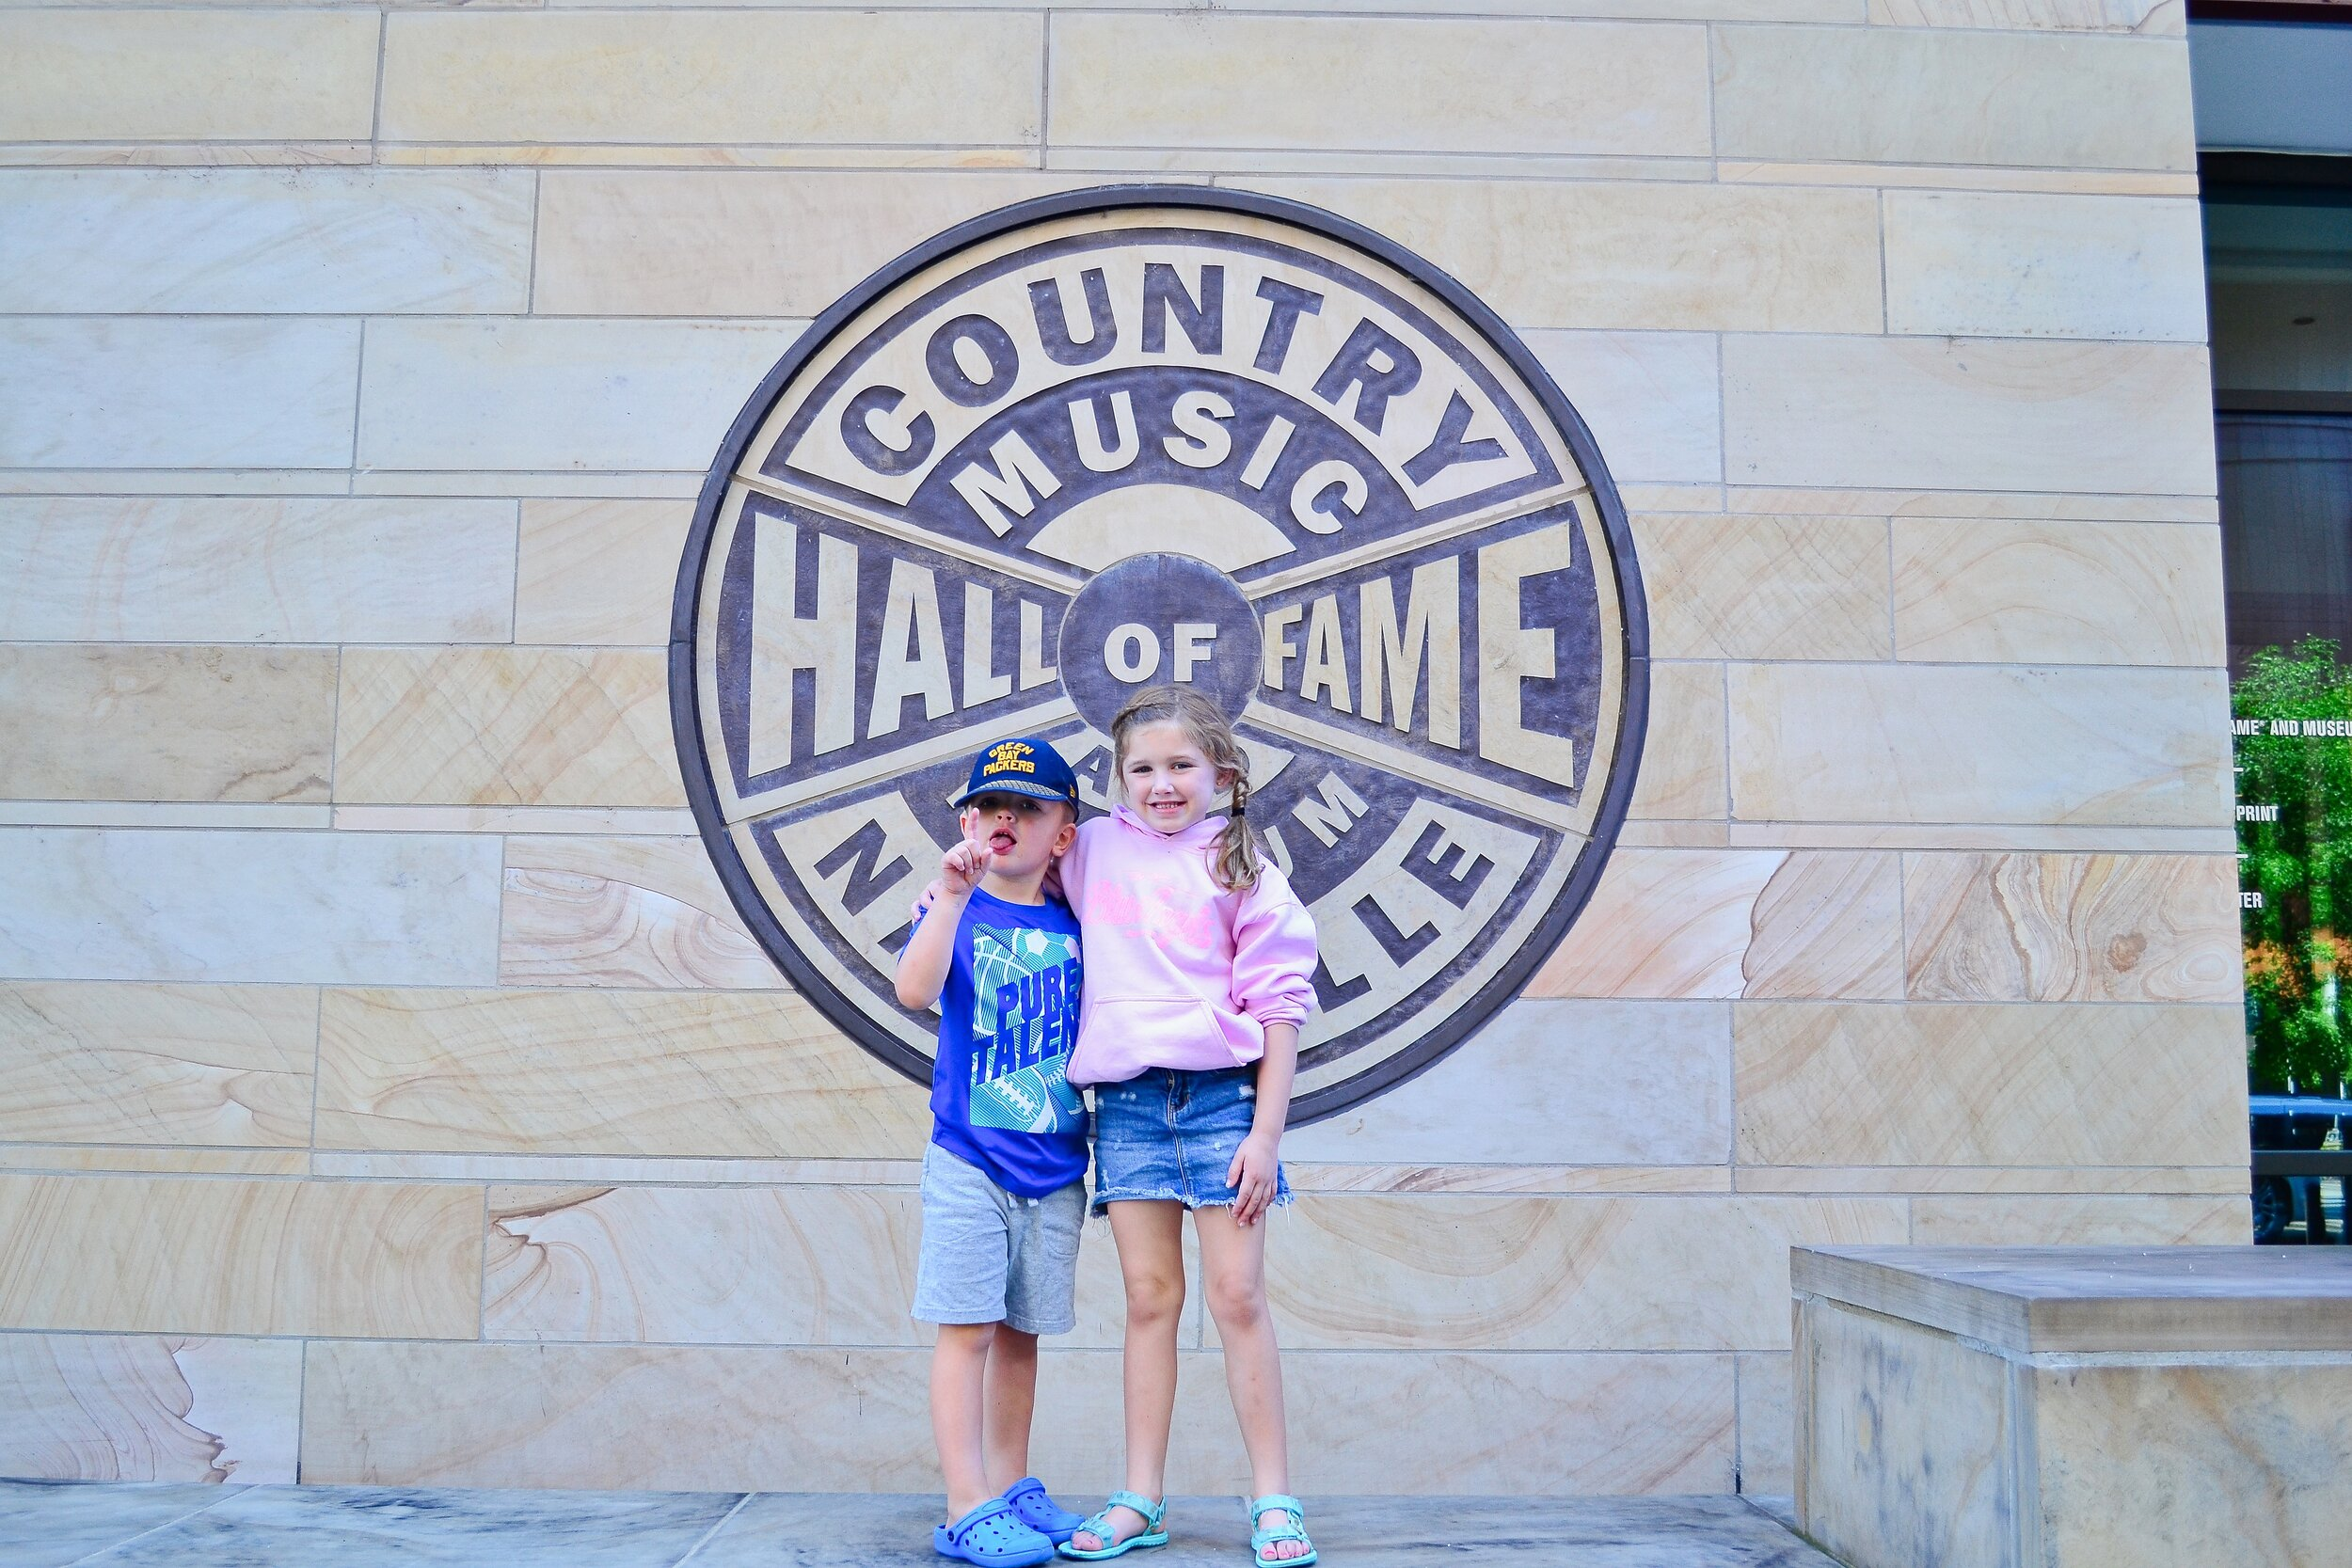 Country Music Hall of Fame.jpeg